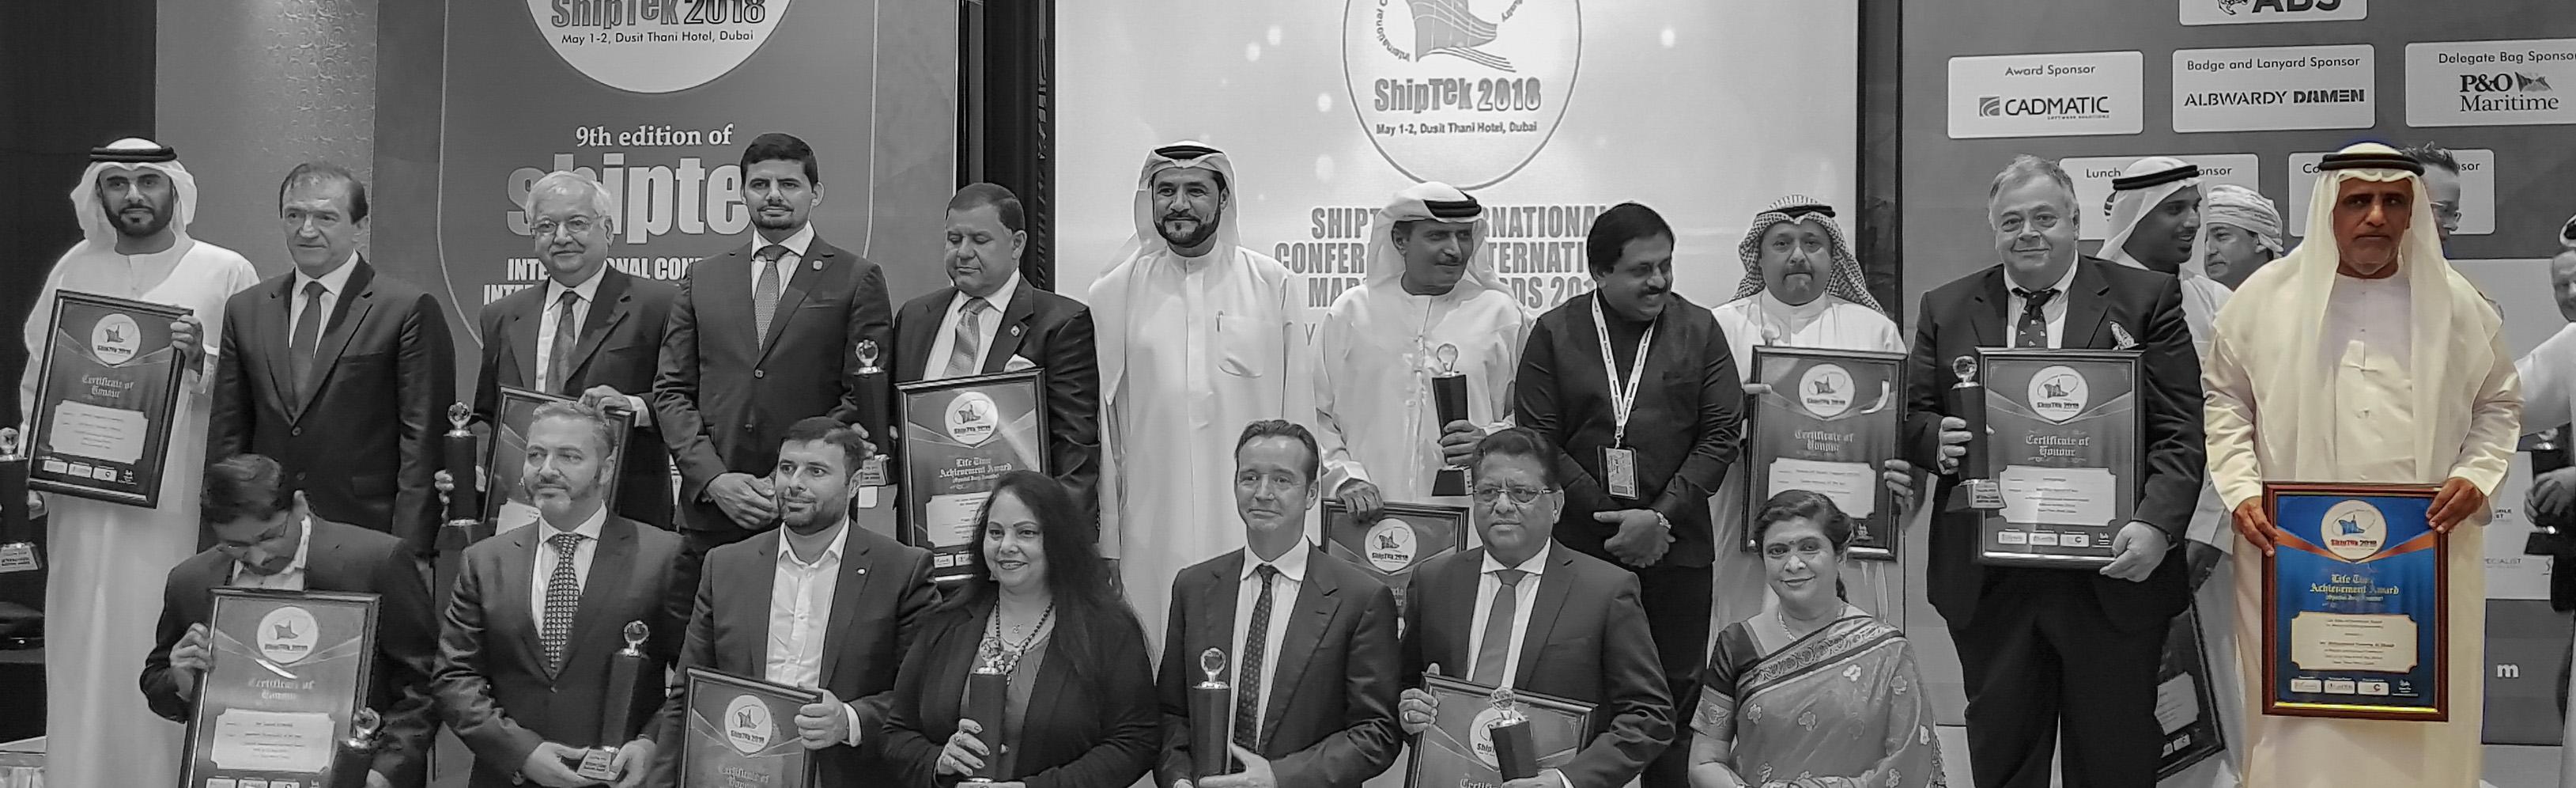 Lifetime-achievement-award-maritime-entrepreneurship